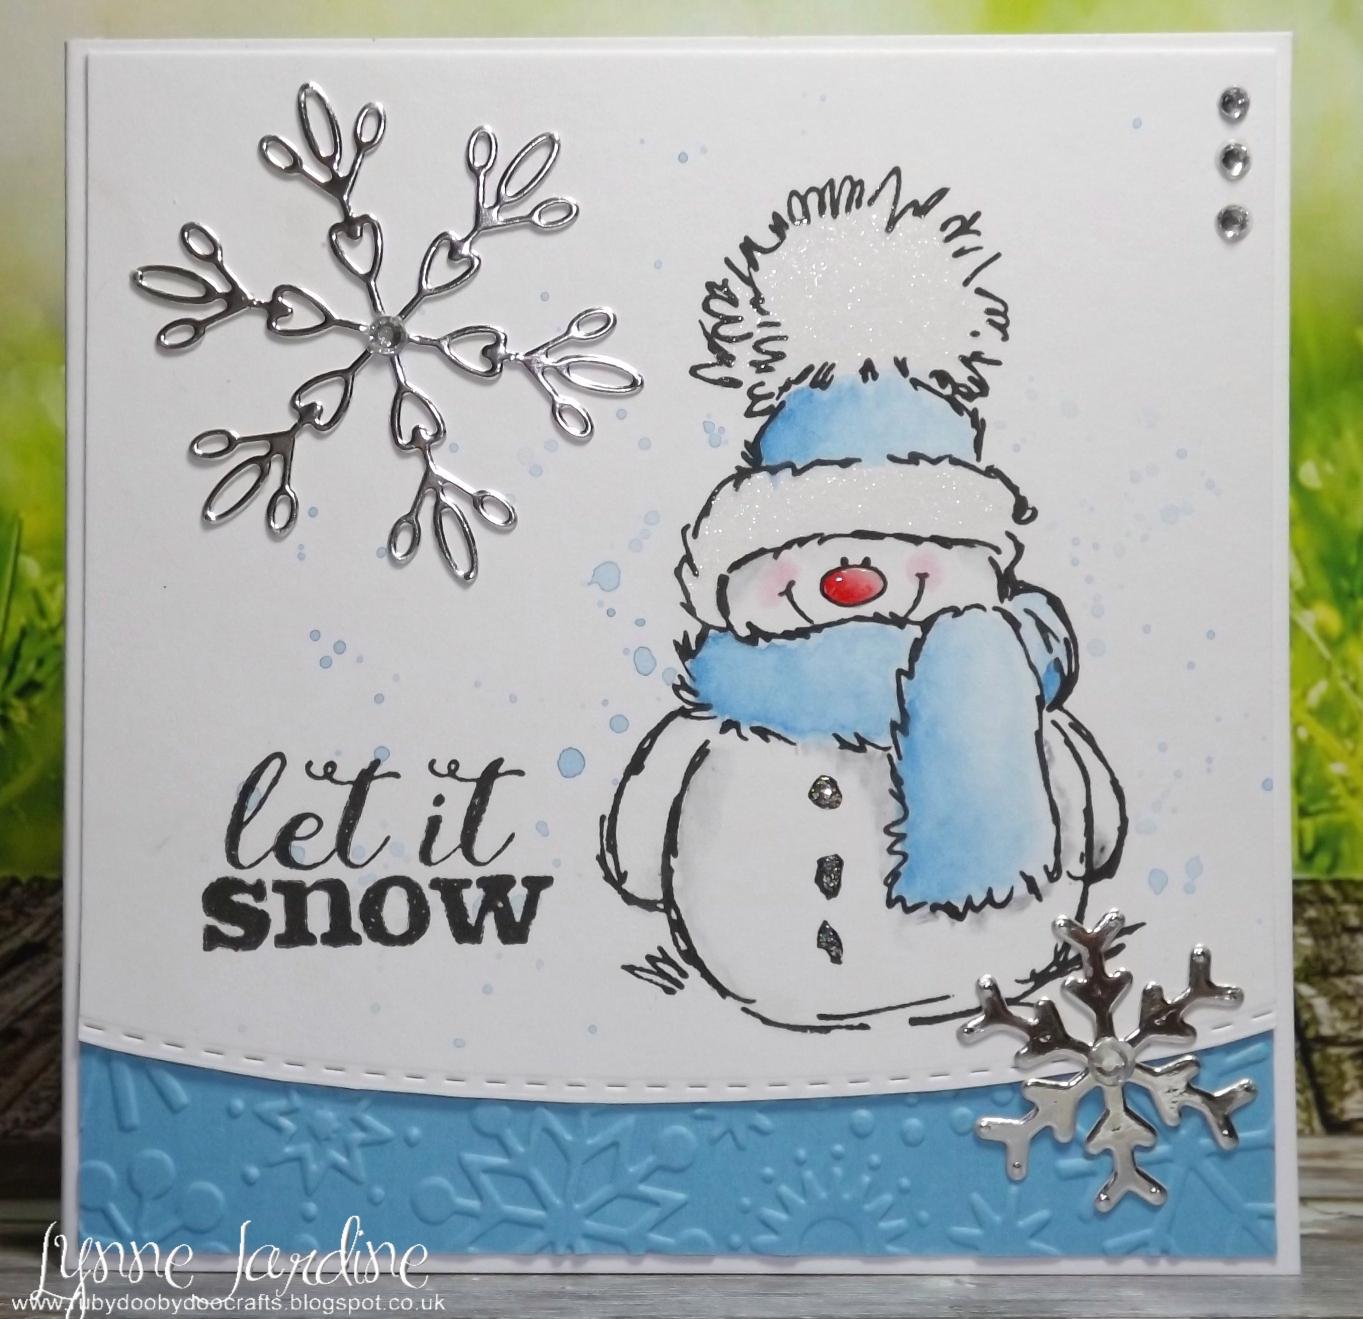 Ruby-Dooby-Doo Crafts: Blue Snowy